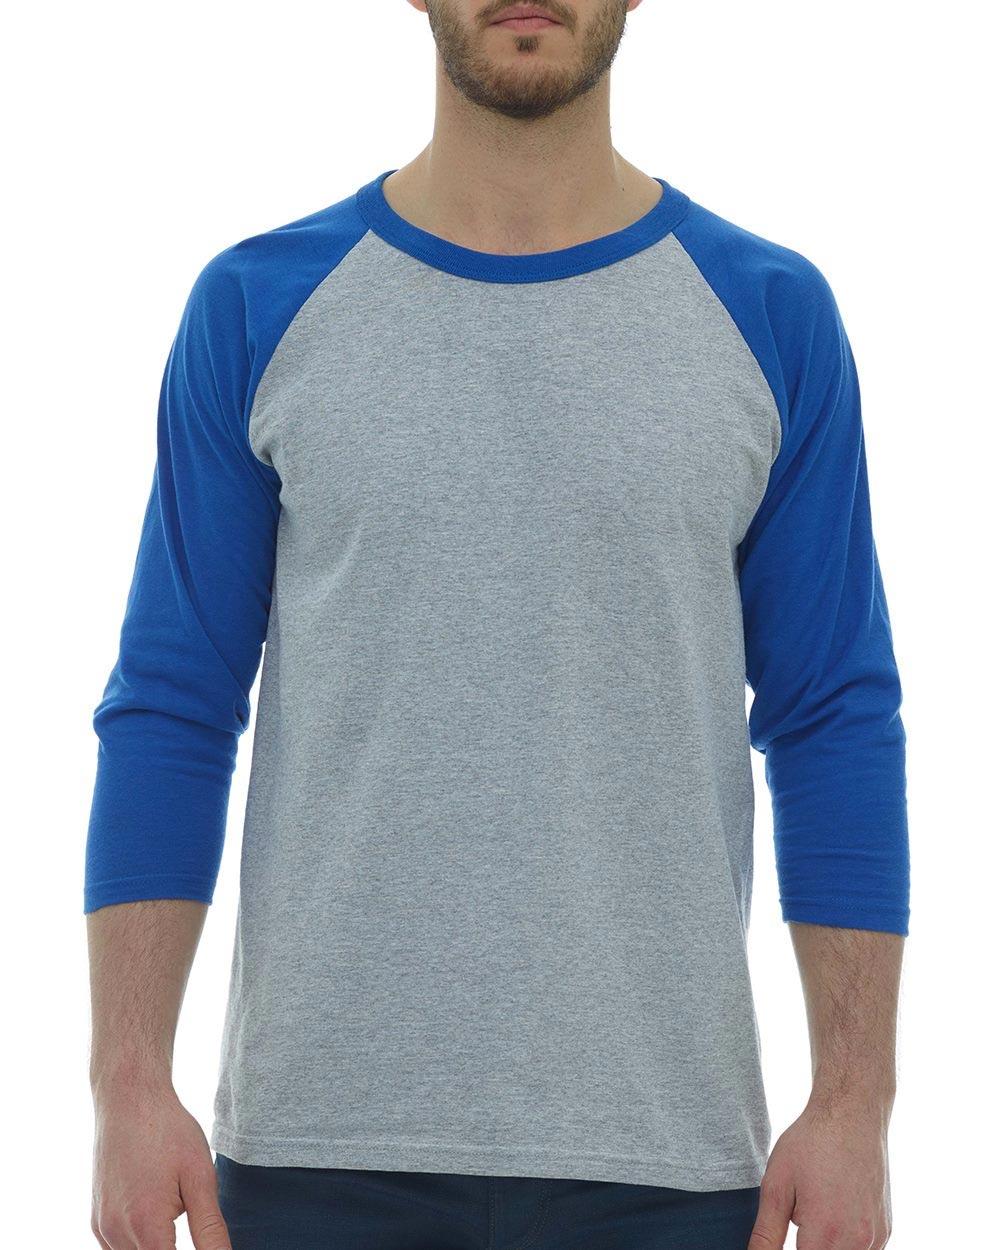 M&O Knits 5540 - Raglan 3/4 Sleeve Baseball T-Shirt